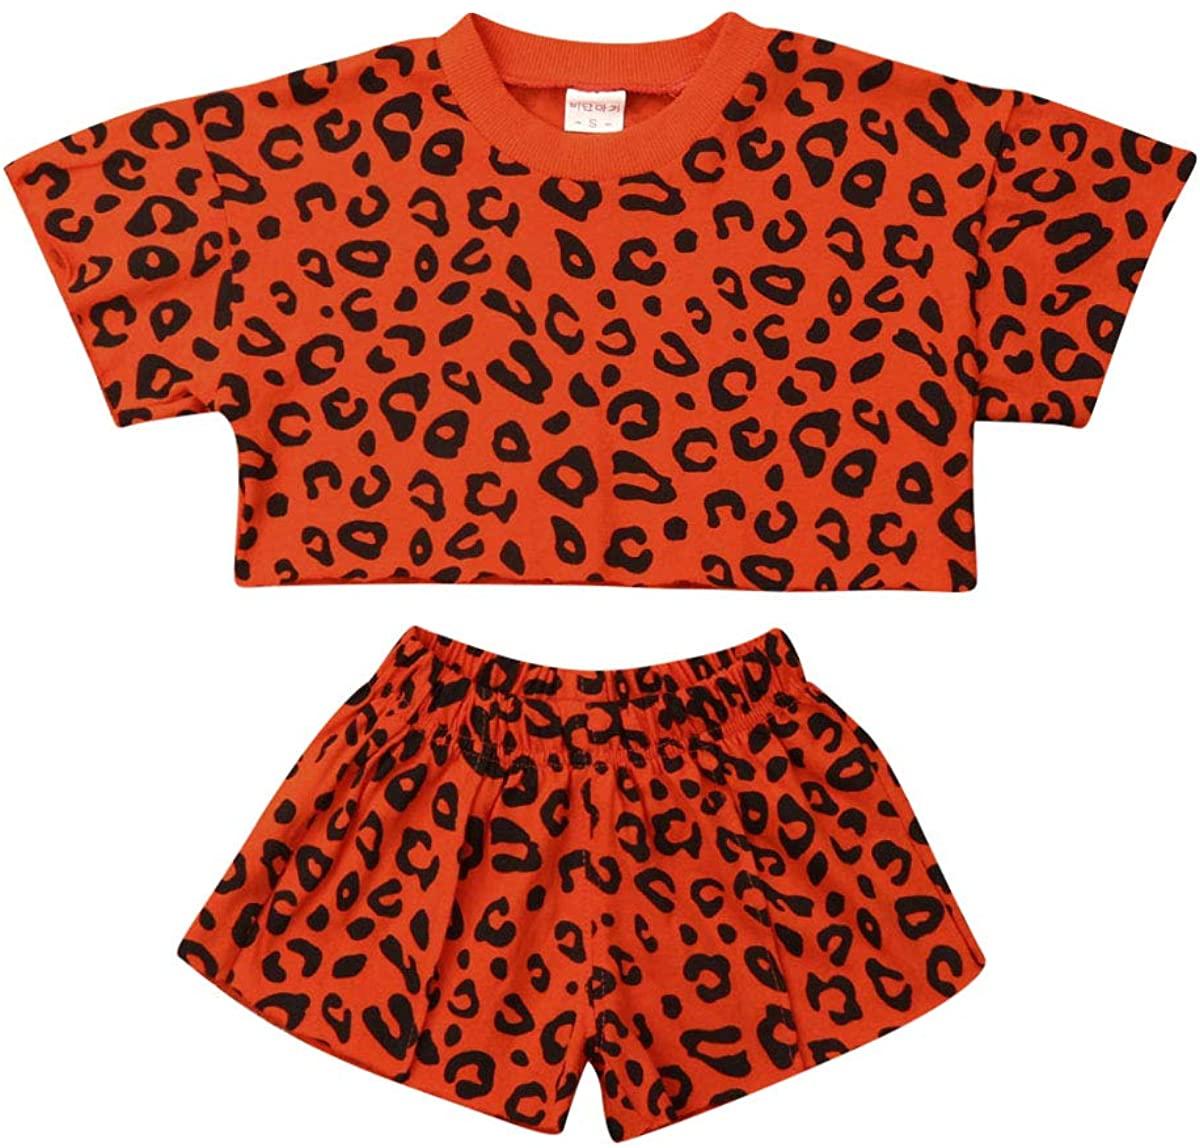 Toddler Kid Baby Girl Summer Cheetah Tops Tshirt Blouse Pocket PU Leather Shorts Pants 2Pcs Set Clothes Outfits